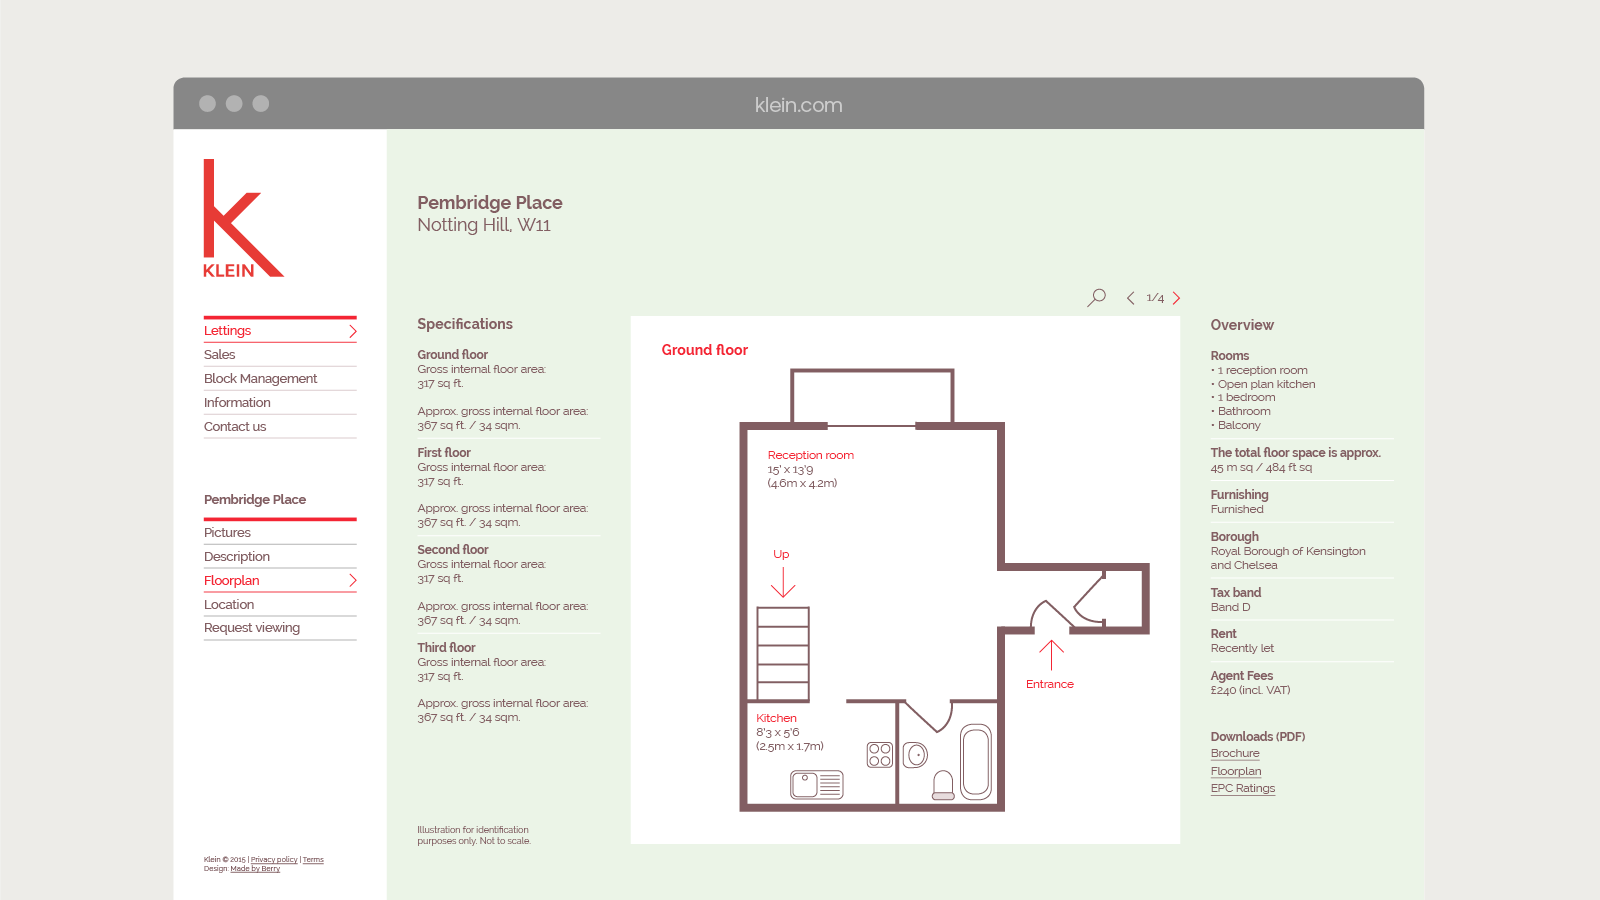 property-agency-visual-branding-identity-design-milton-keynes-london-17